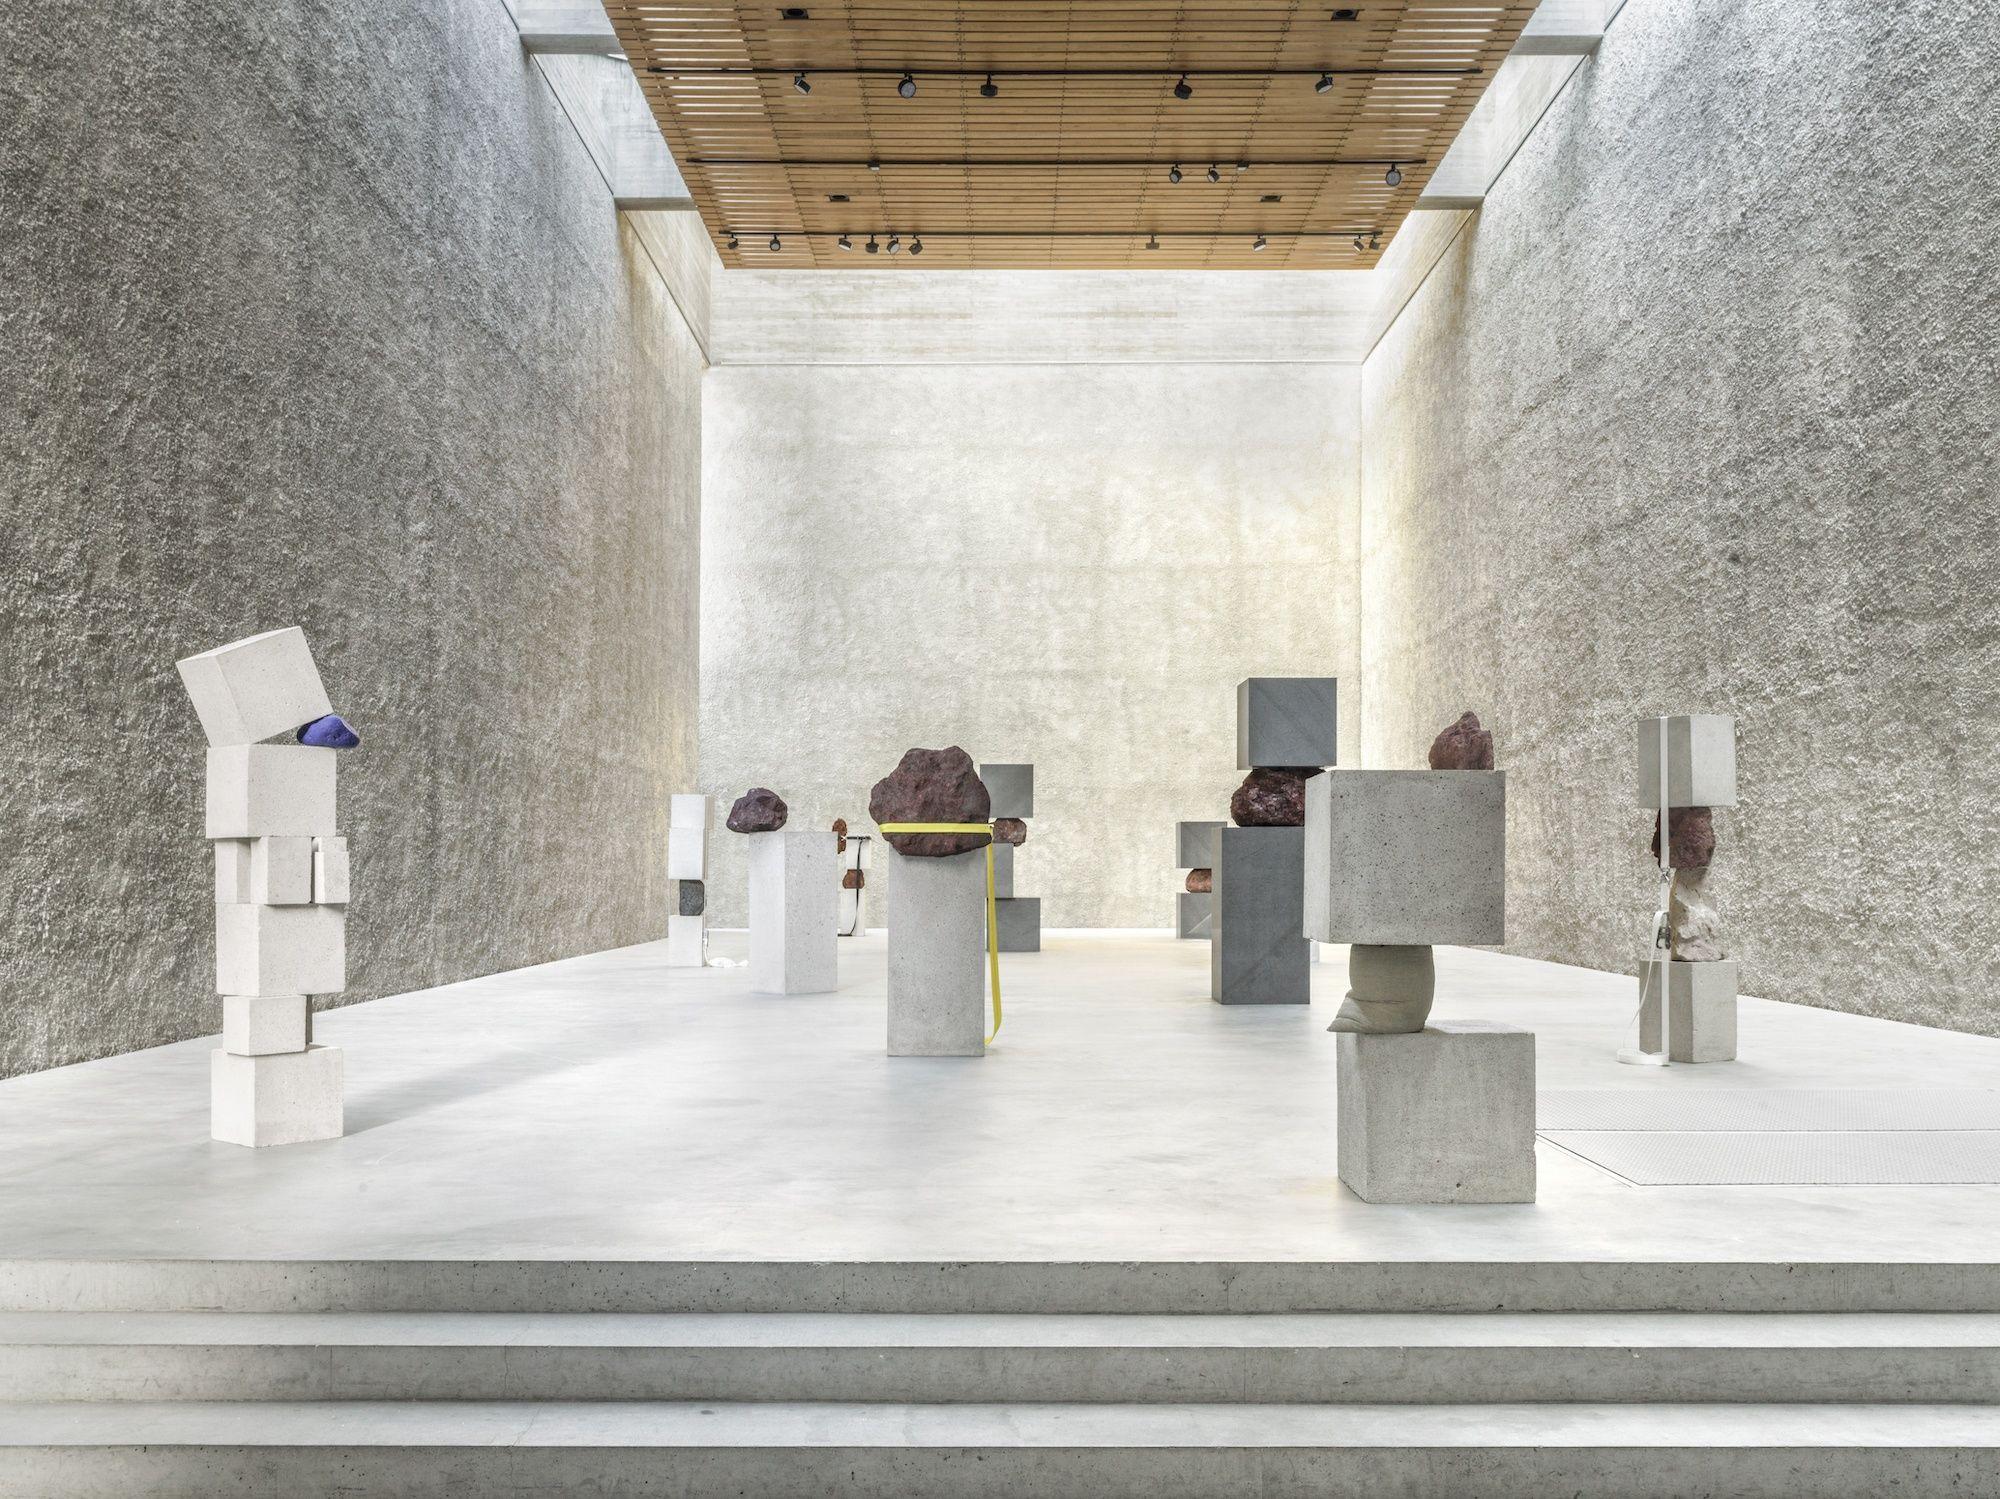 Studio Mk27 S Radical Exercise In Horizontality Ignant Exhibition Berlin Art Dealer